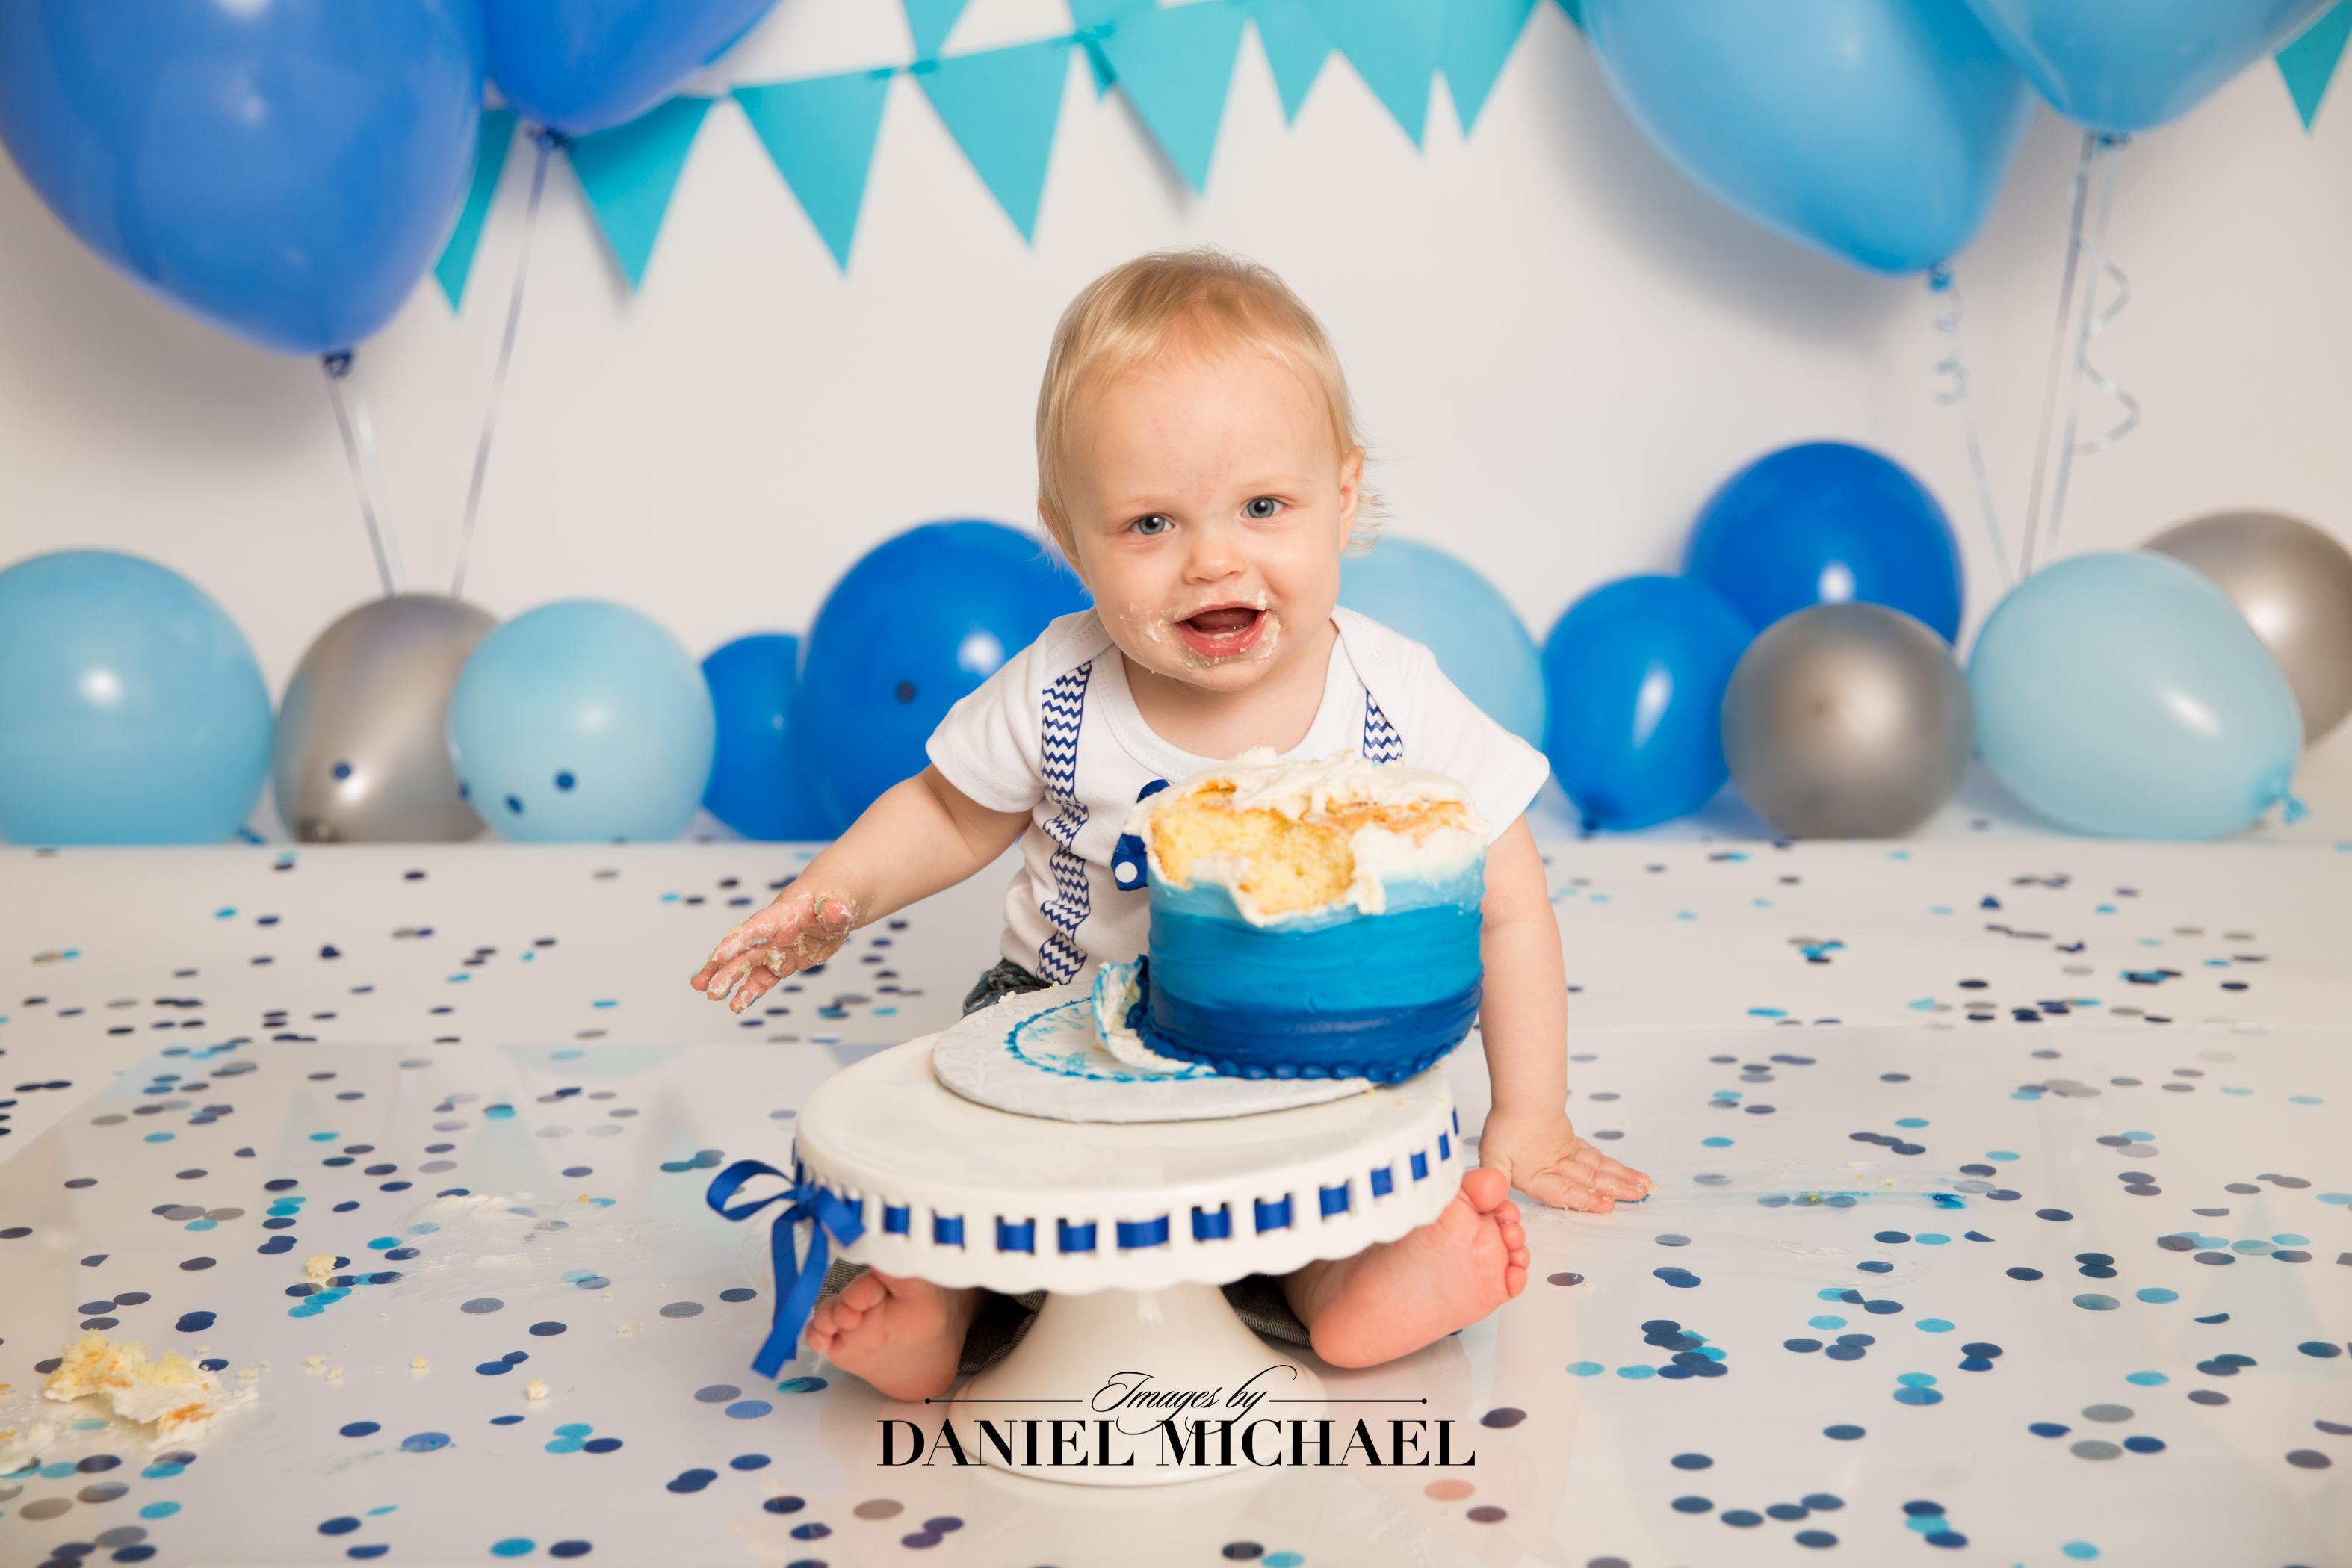 Cincinnati Cake Smash, Studio Portraits, Cincinnati Photography, Daniel Michael, Jessica Rist